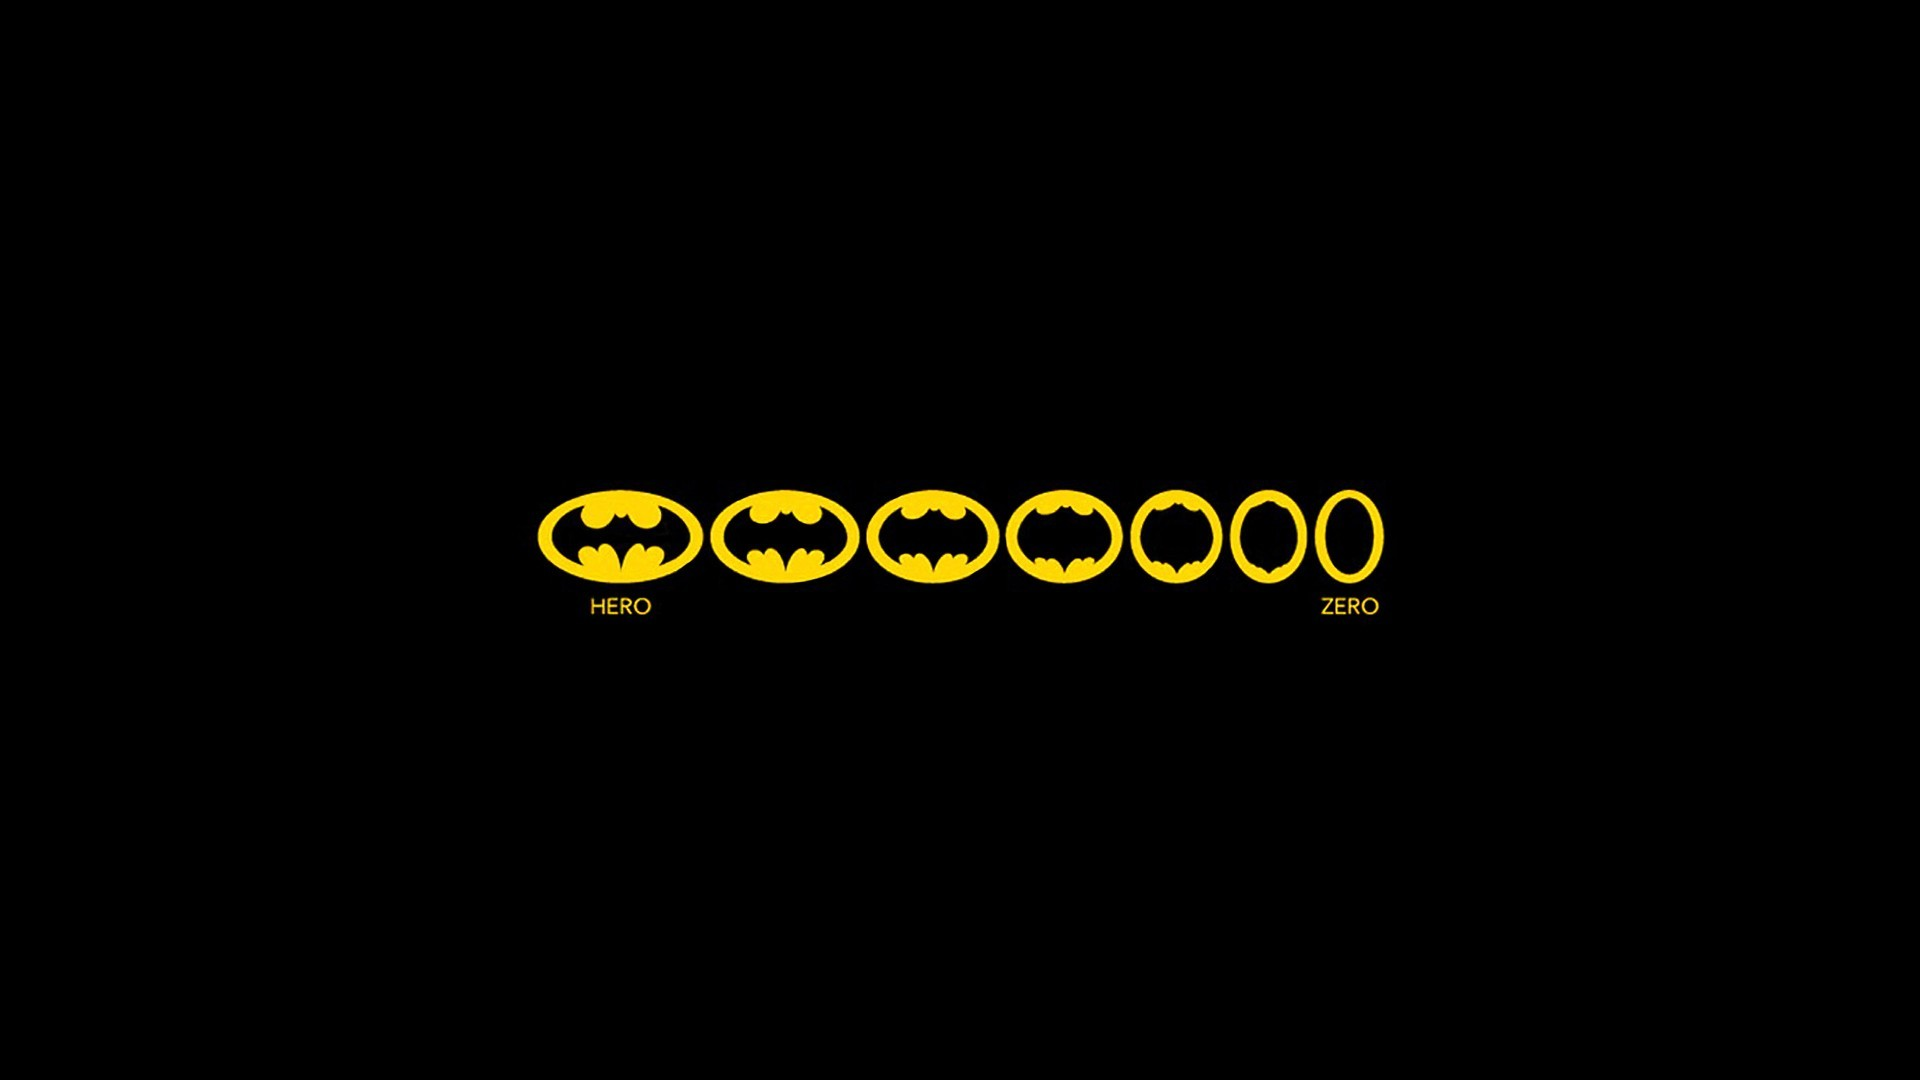 funny cool wallpapers wallpaper hero batman 1920×1080